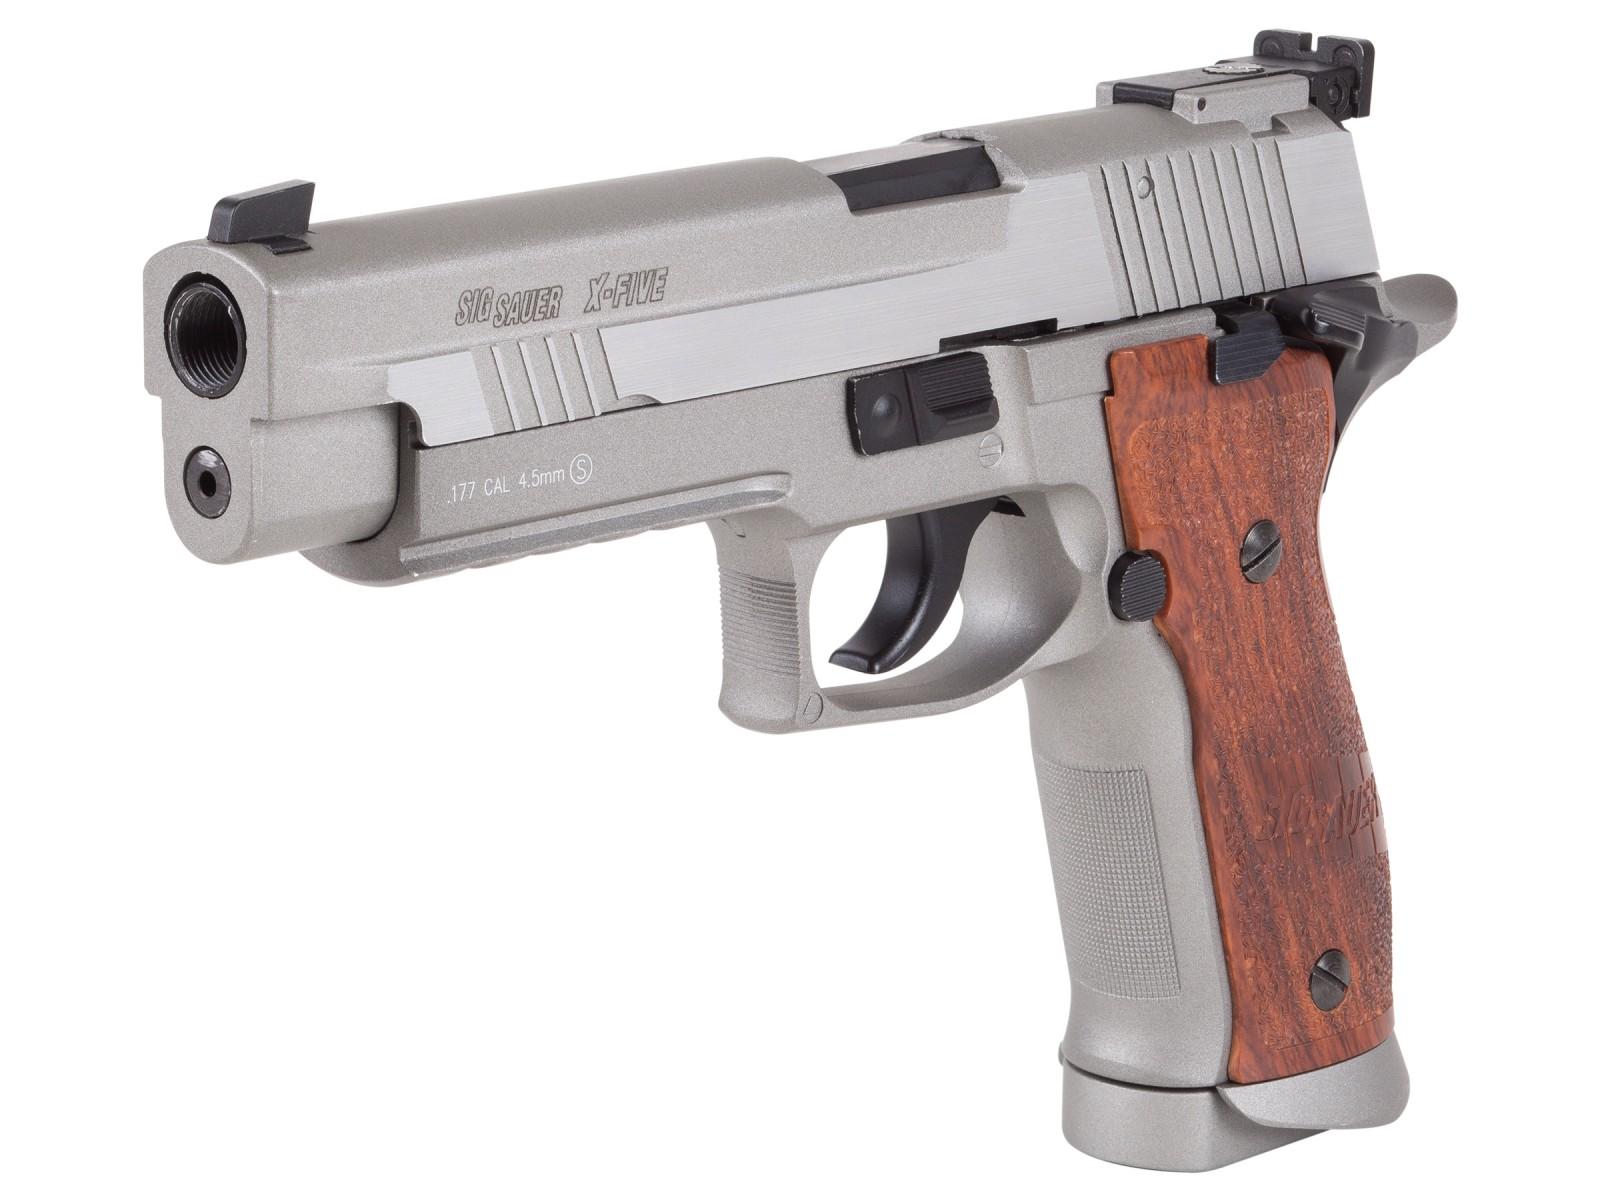 SIG Sauer P226 X-Five .177 CO2 Pistol, Silver/Wood Grips